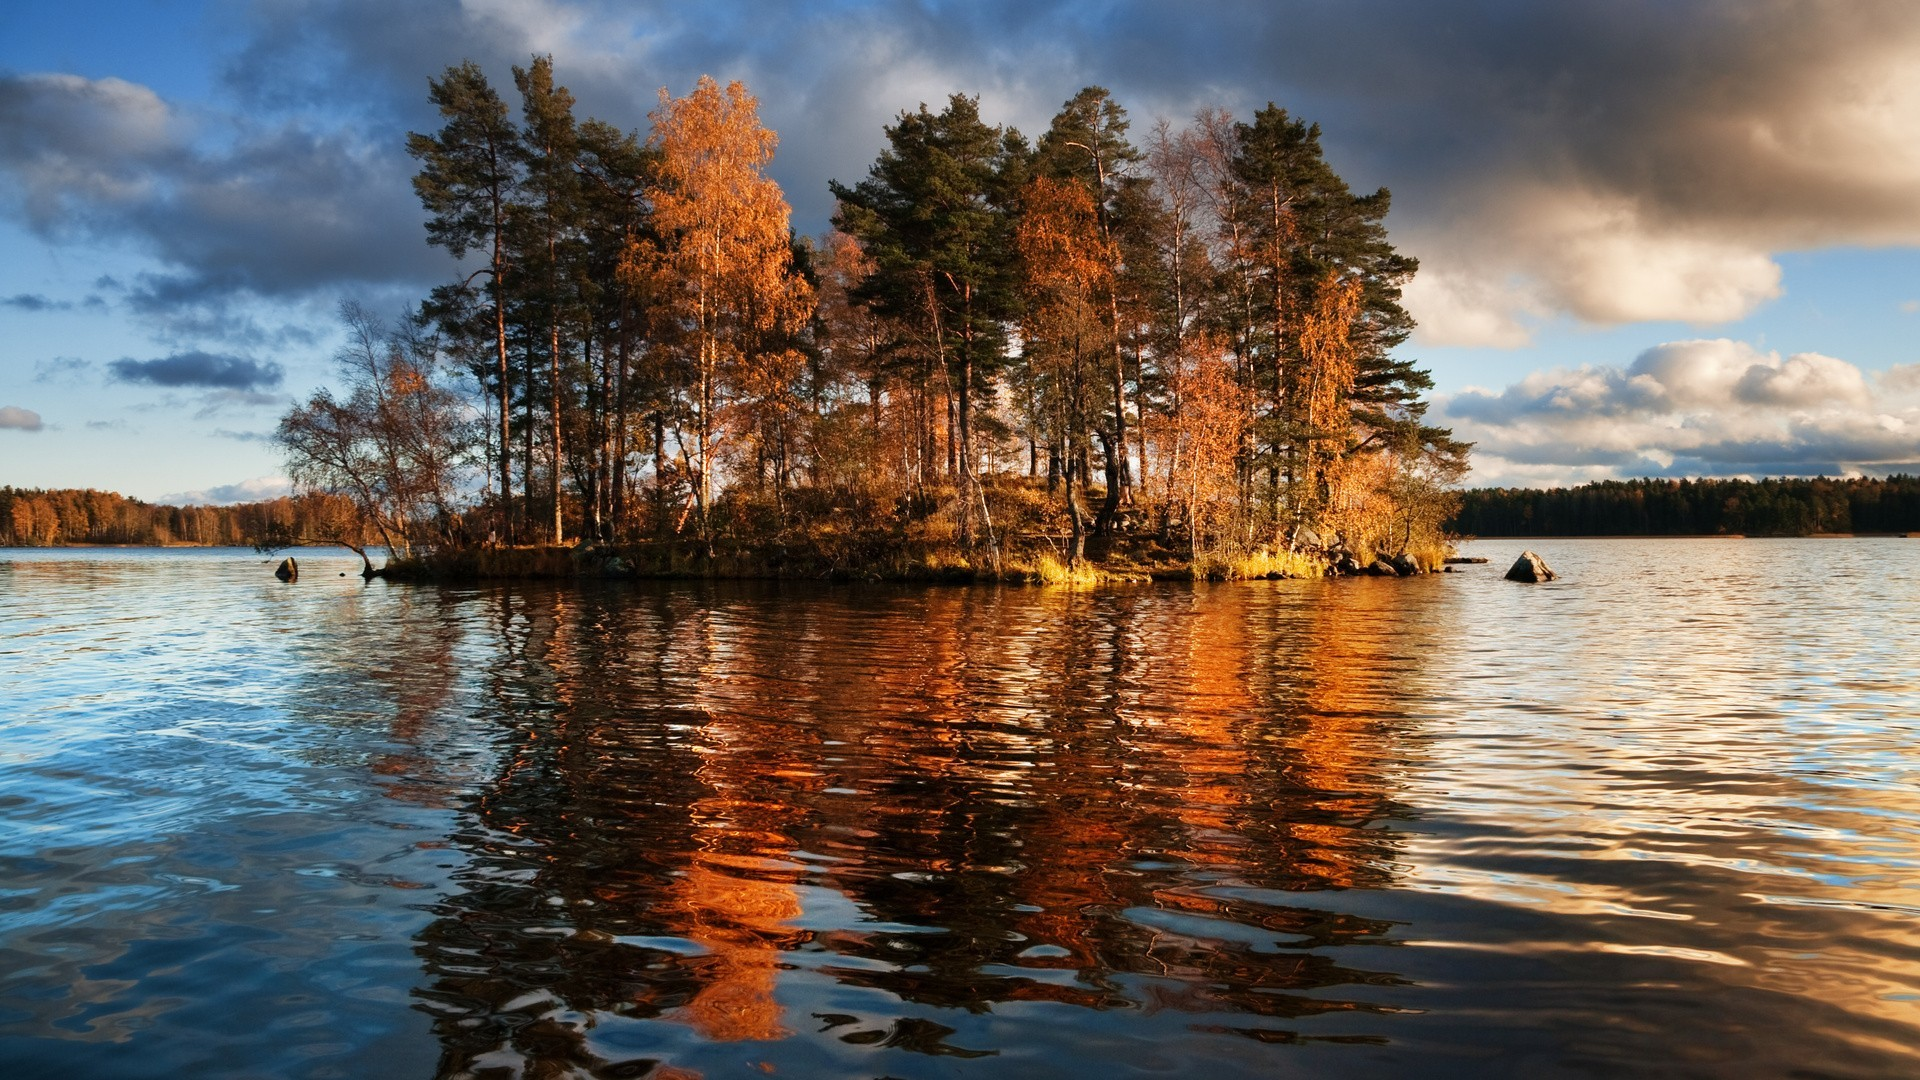 Res: 1920x1080, Lake trees autumn fall reflection wallpaper      117633    WallpaperUP